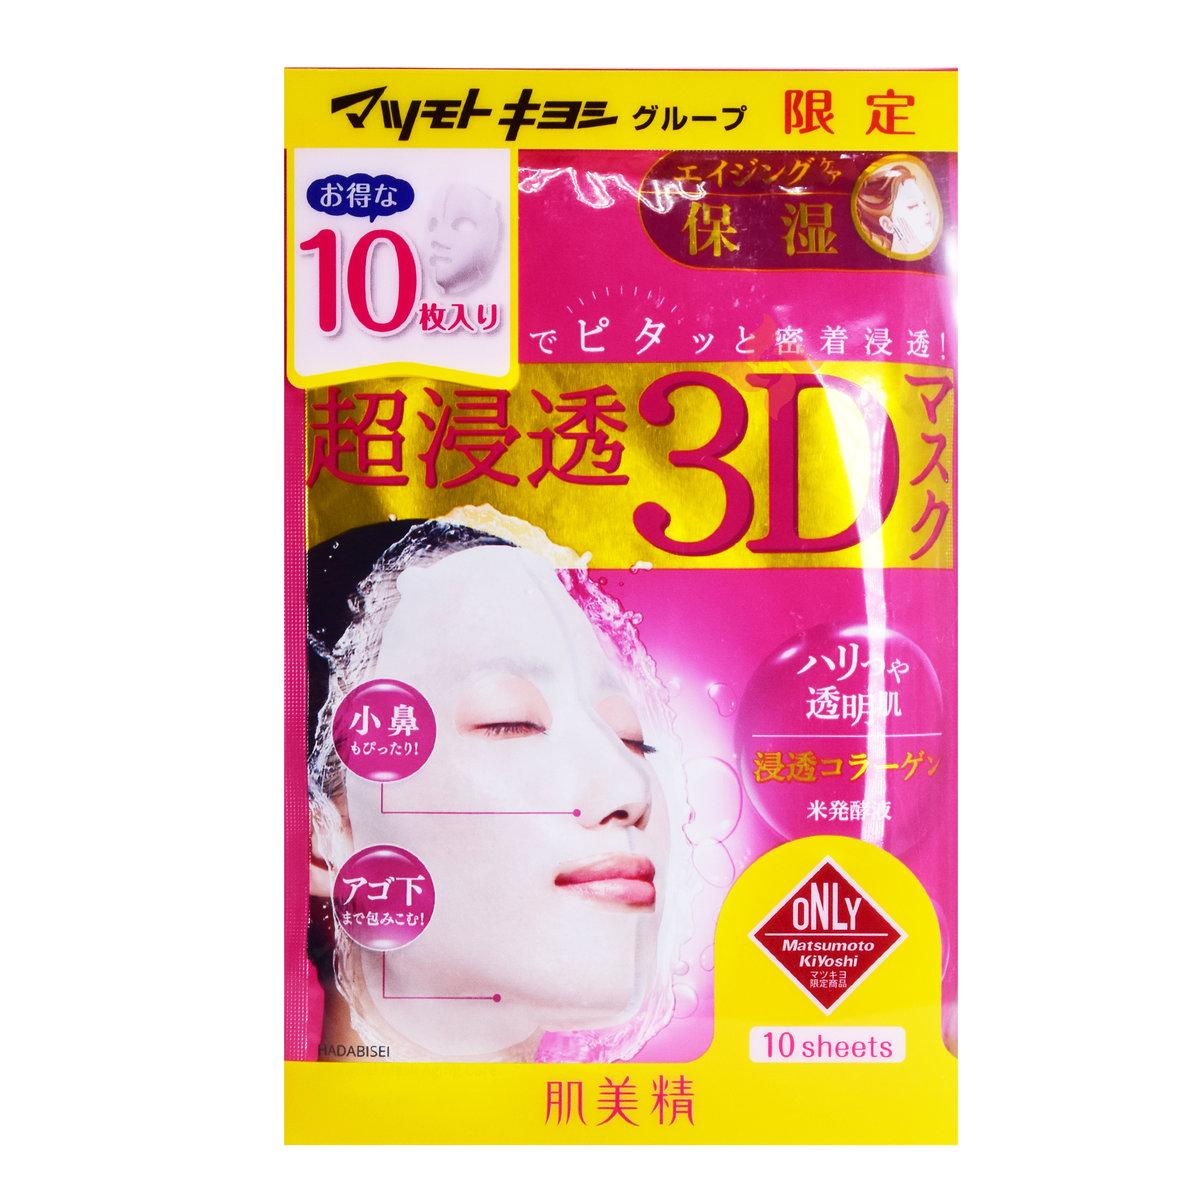 Hadabisei 3D Face Mask (Aging-care Moisturizing) 10pcs (4901417695673)